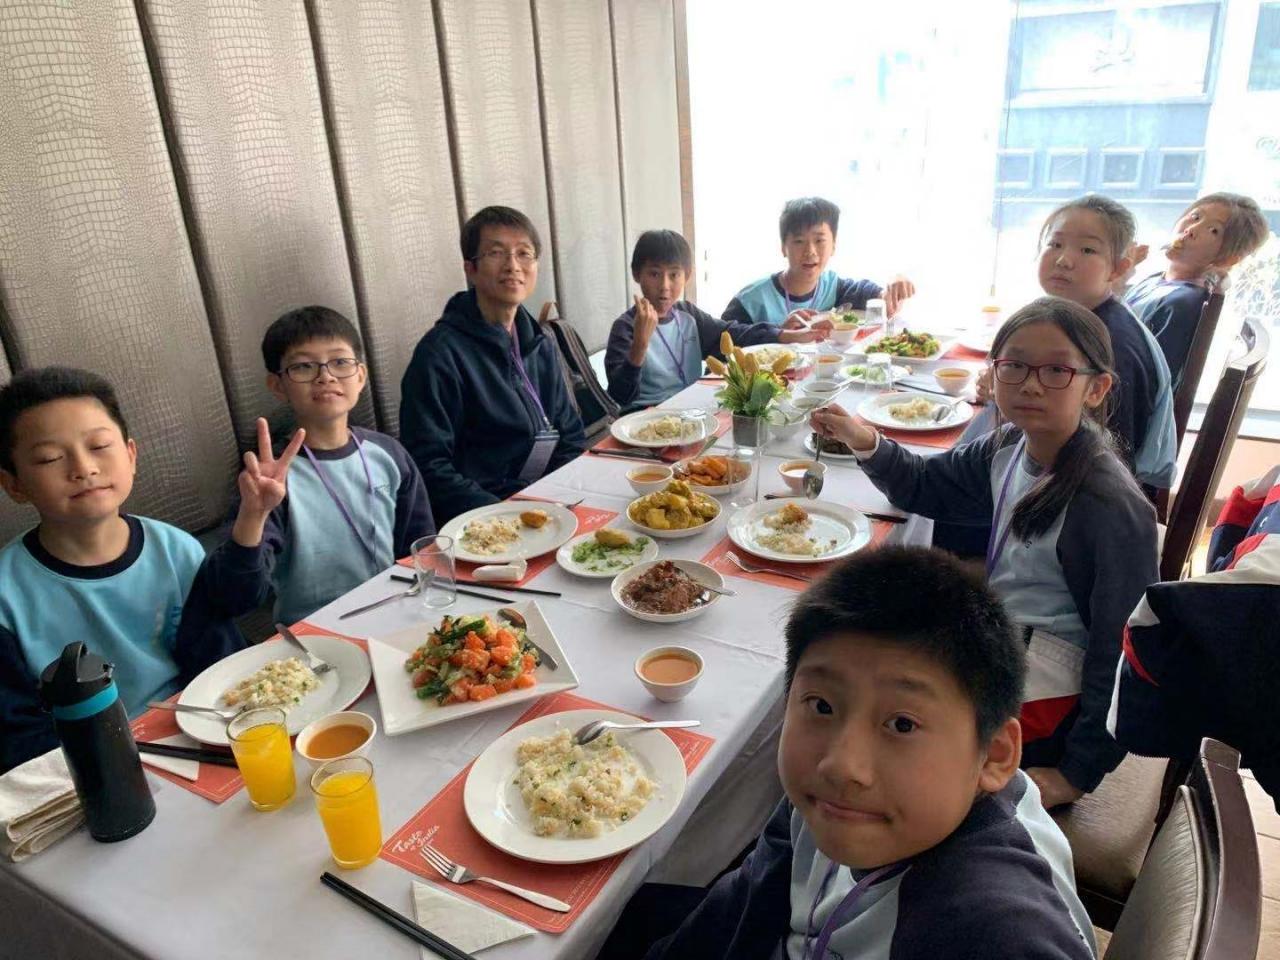 http://keito.school.hk/sites/default/files/batch_gwcp9316.jpg